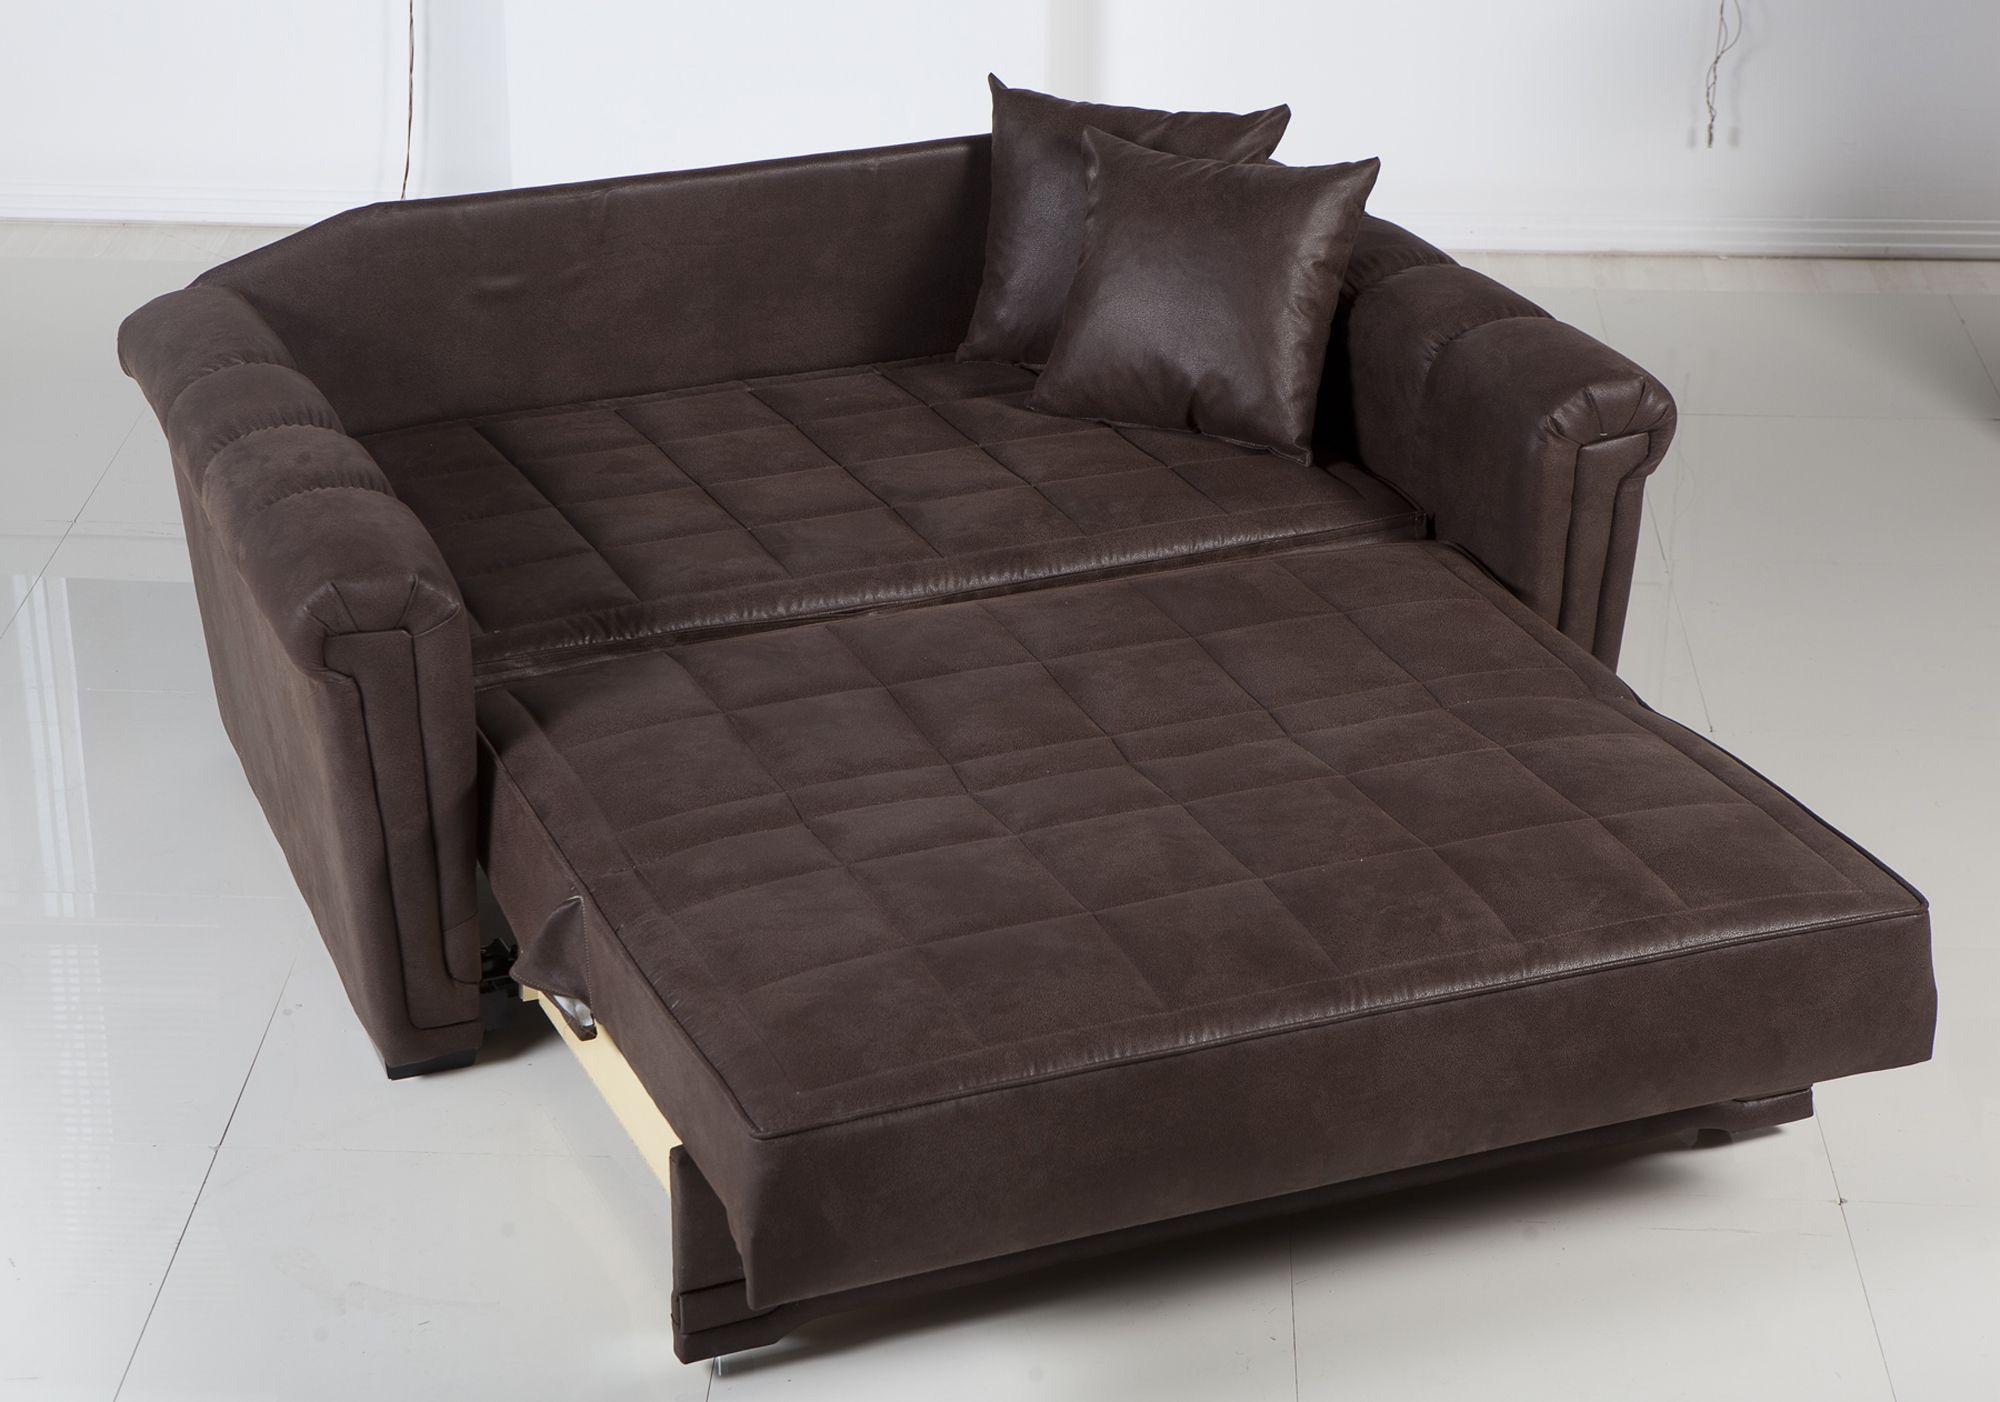 Cool Loveseat Sleeper Bed Good 85 Modern Sofa Ideas With